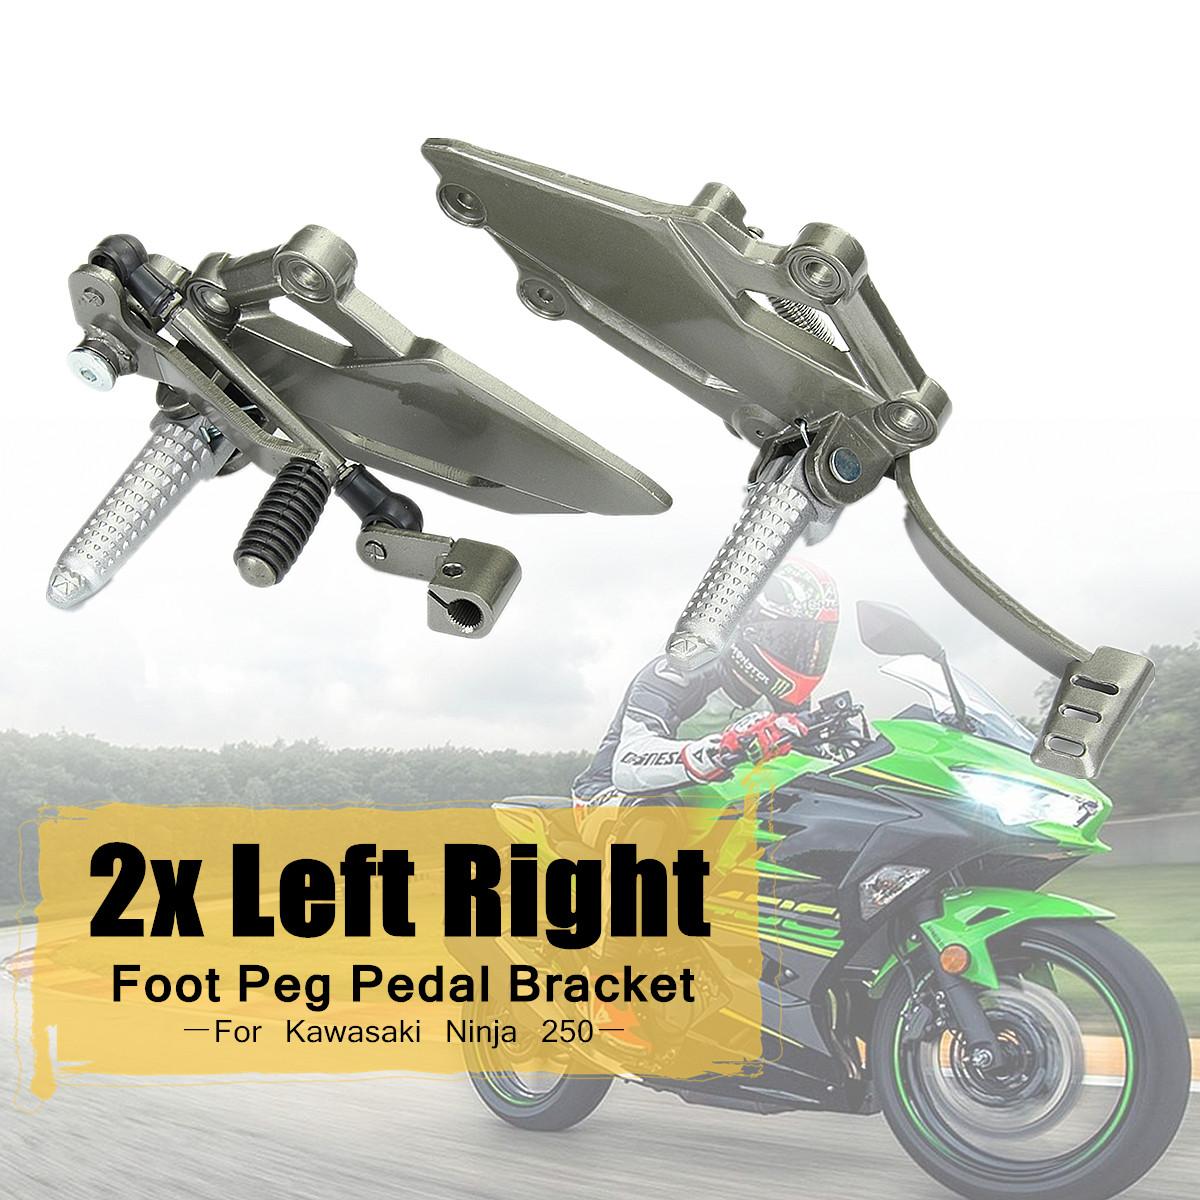 2x Left Right Rear Foot Peg Brake Pedal Footrest Bracket for Kawasaki Ninja 250 Aluminum Alloy Surface Polishing Galvanized